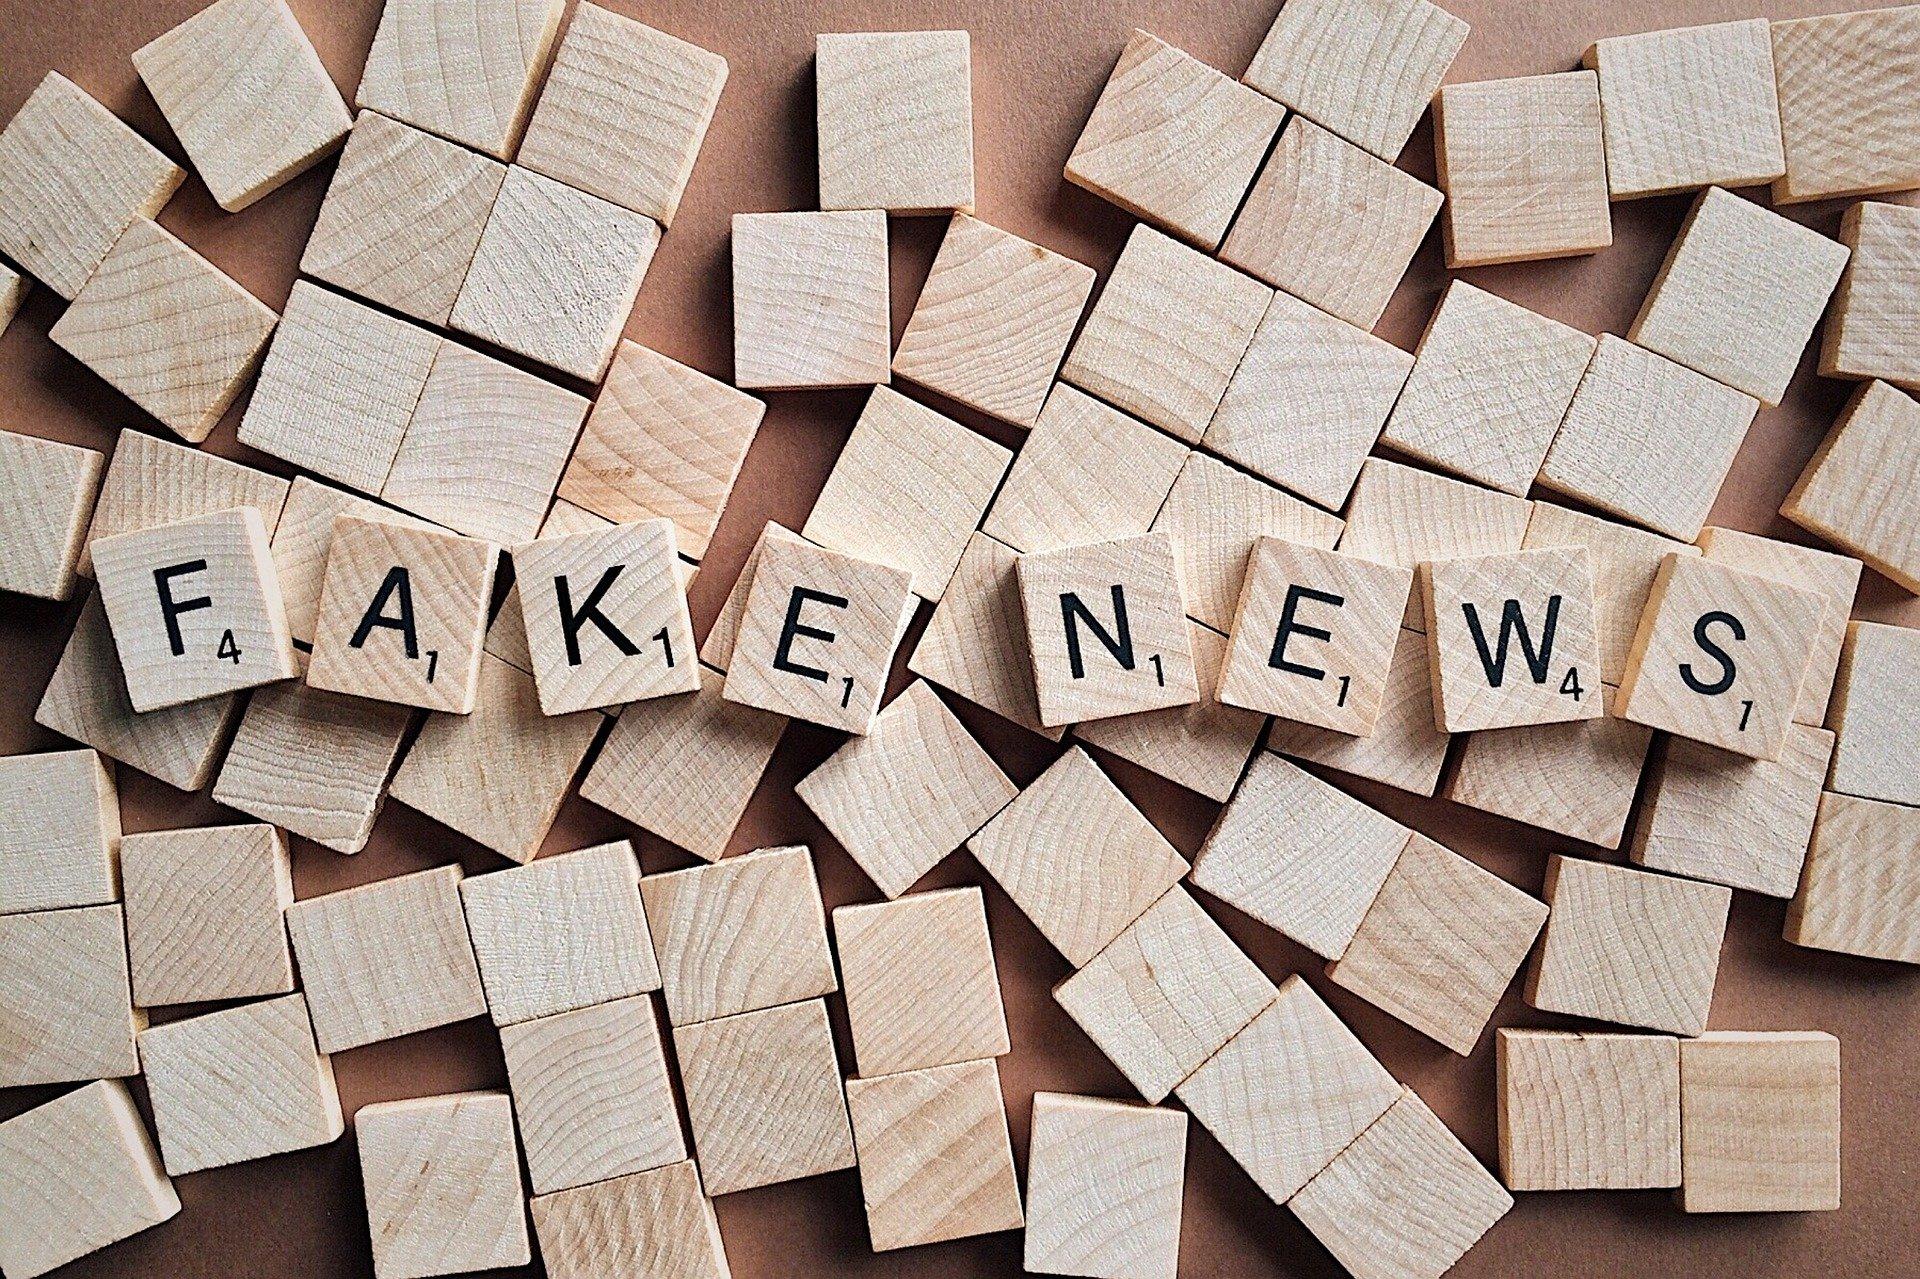 altrovirus_fake news